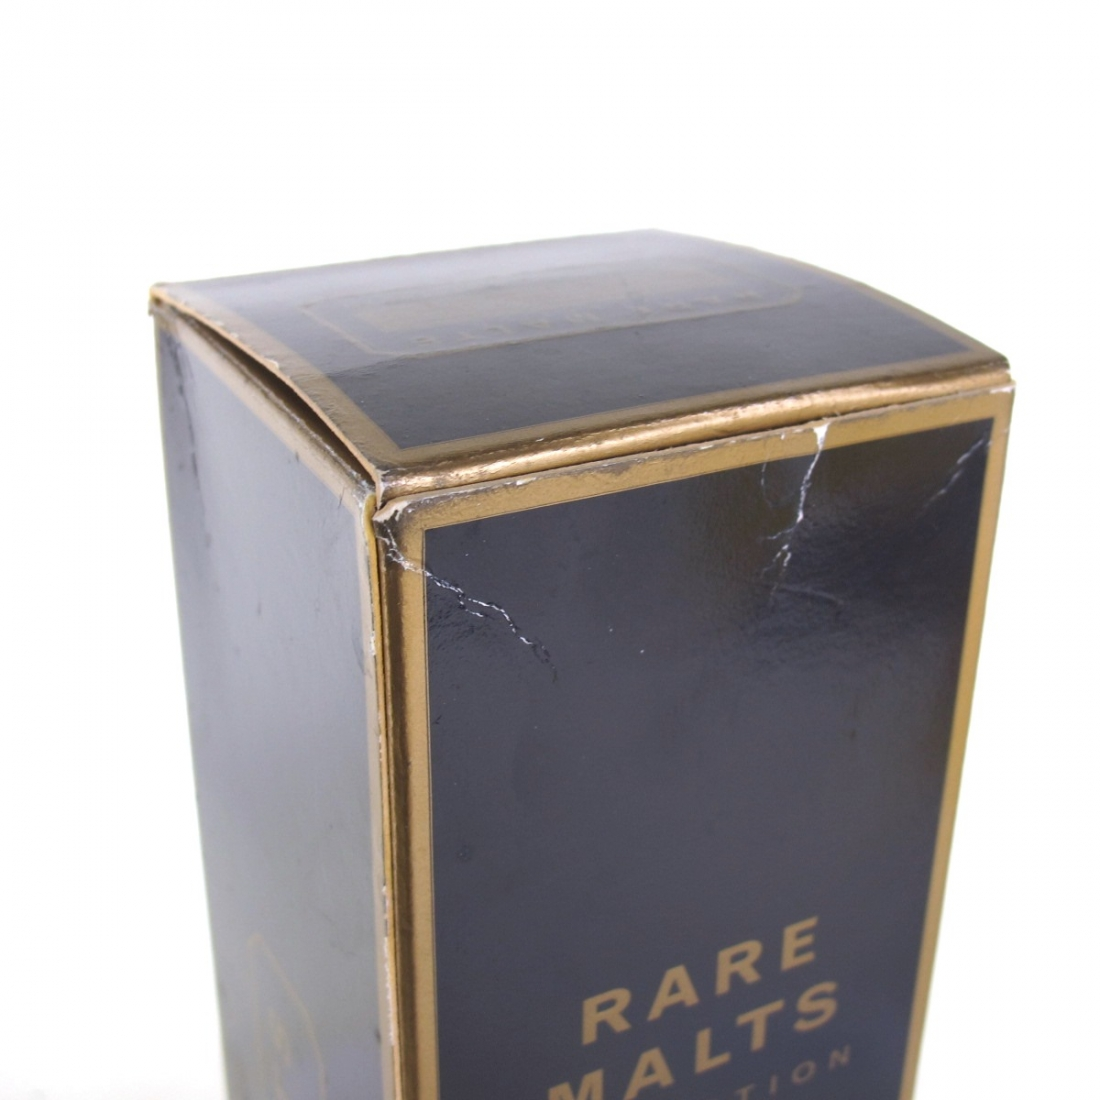 Caol Ila 1977 Rare Malt 20 Year Old 75cl / 61.30%